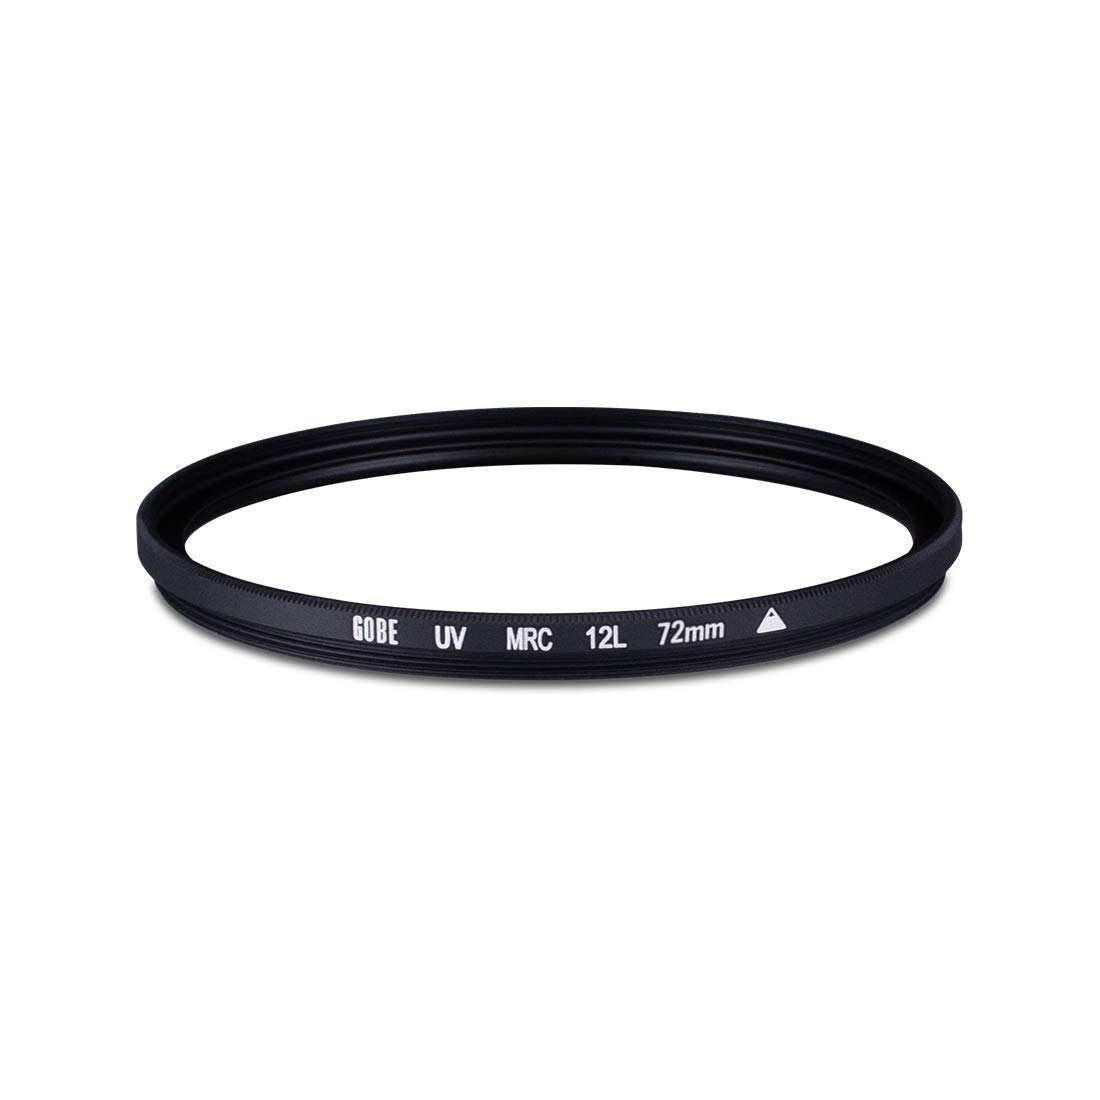 "Filtro Ultravioleta UV 40.5mm Vidrio Japan Optics/"" Recubierto con 12 Capas multirresistentes Gobe"